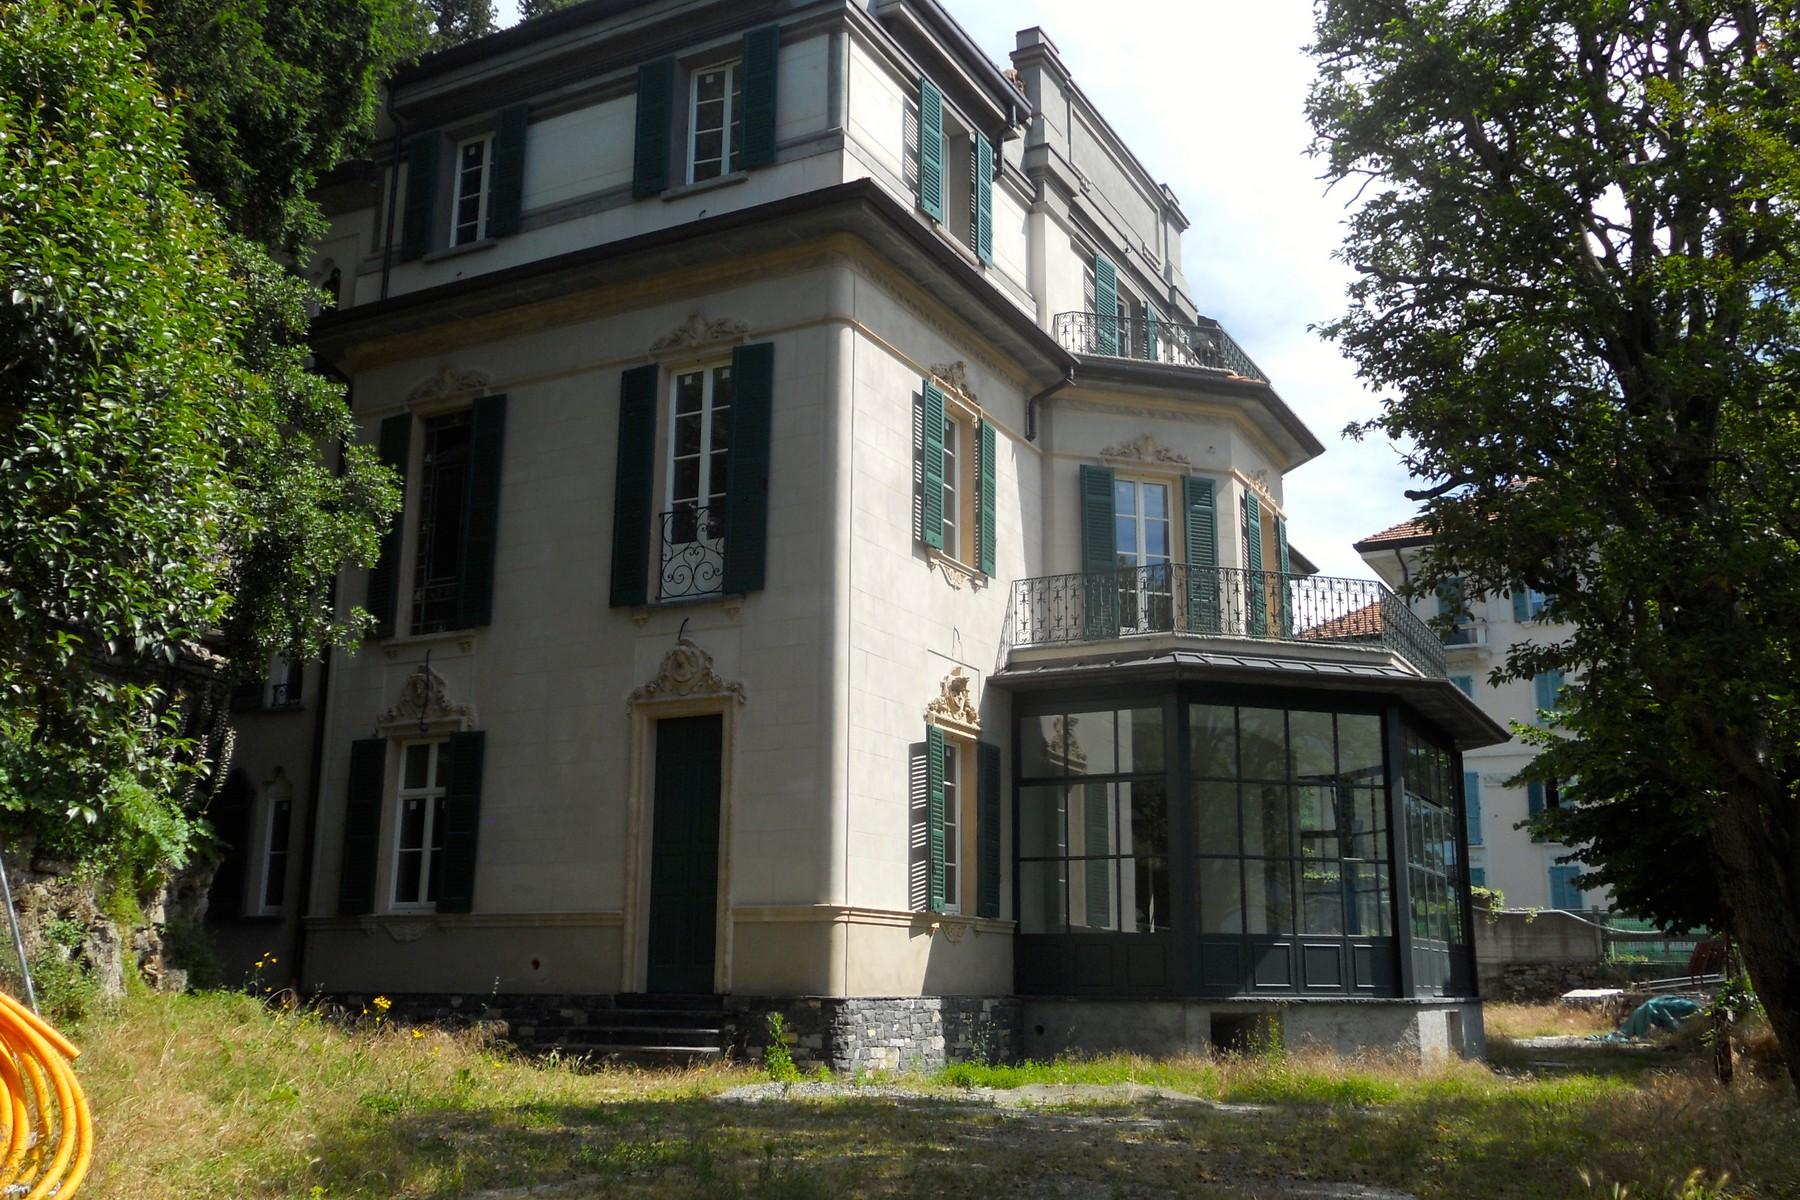 Additional photo for property listing at Prestigieux villa historique face au lac avec parc botanique Via Regina Carate Urio, Como 22010 Italie